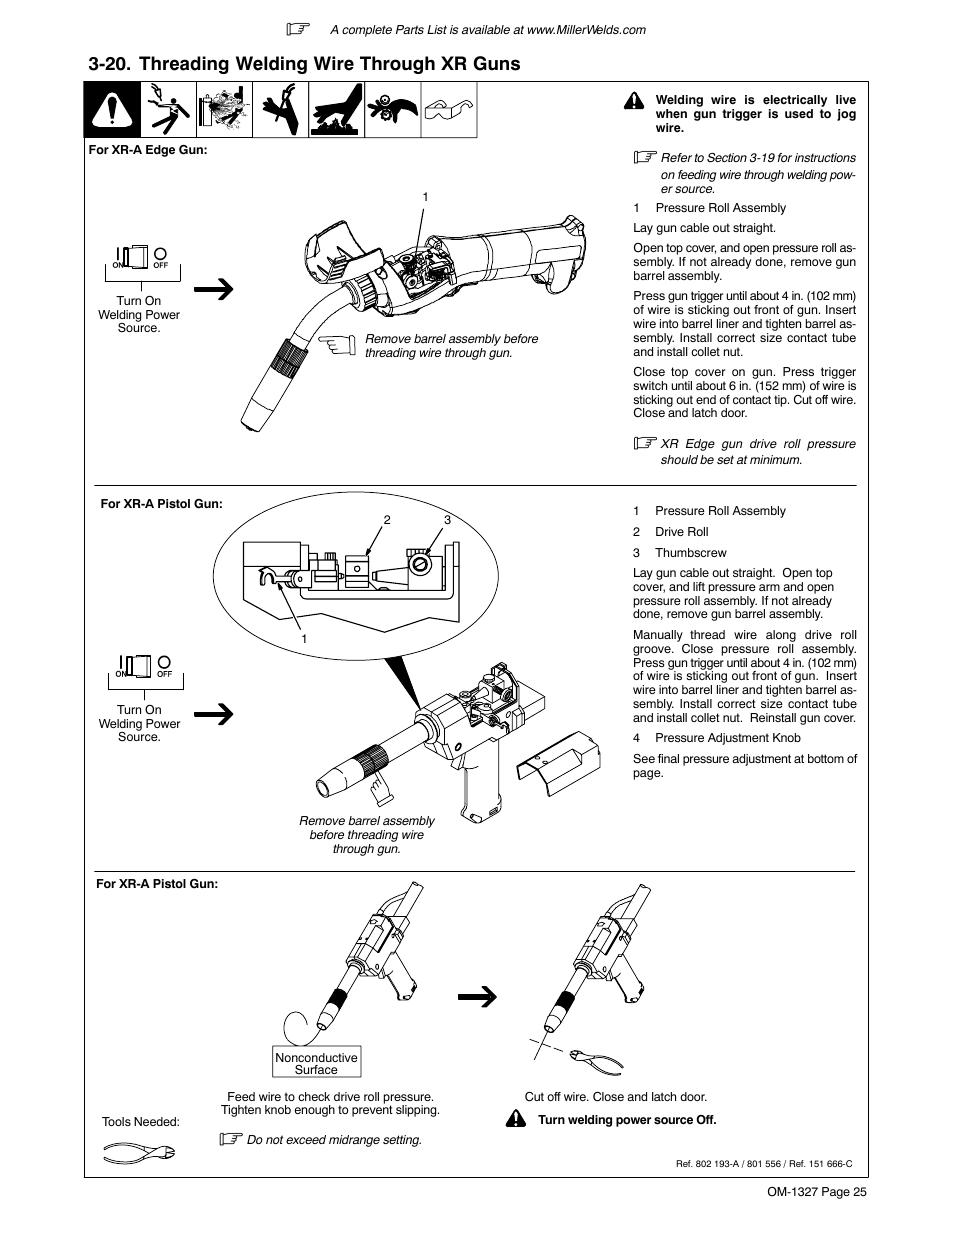 medium resolution of 20 threading welding wire through xr guns miller electric millermatic 350p user manual